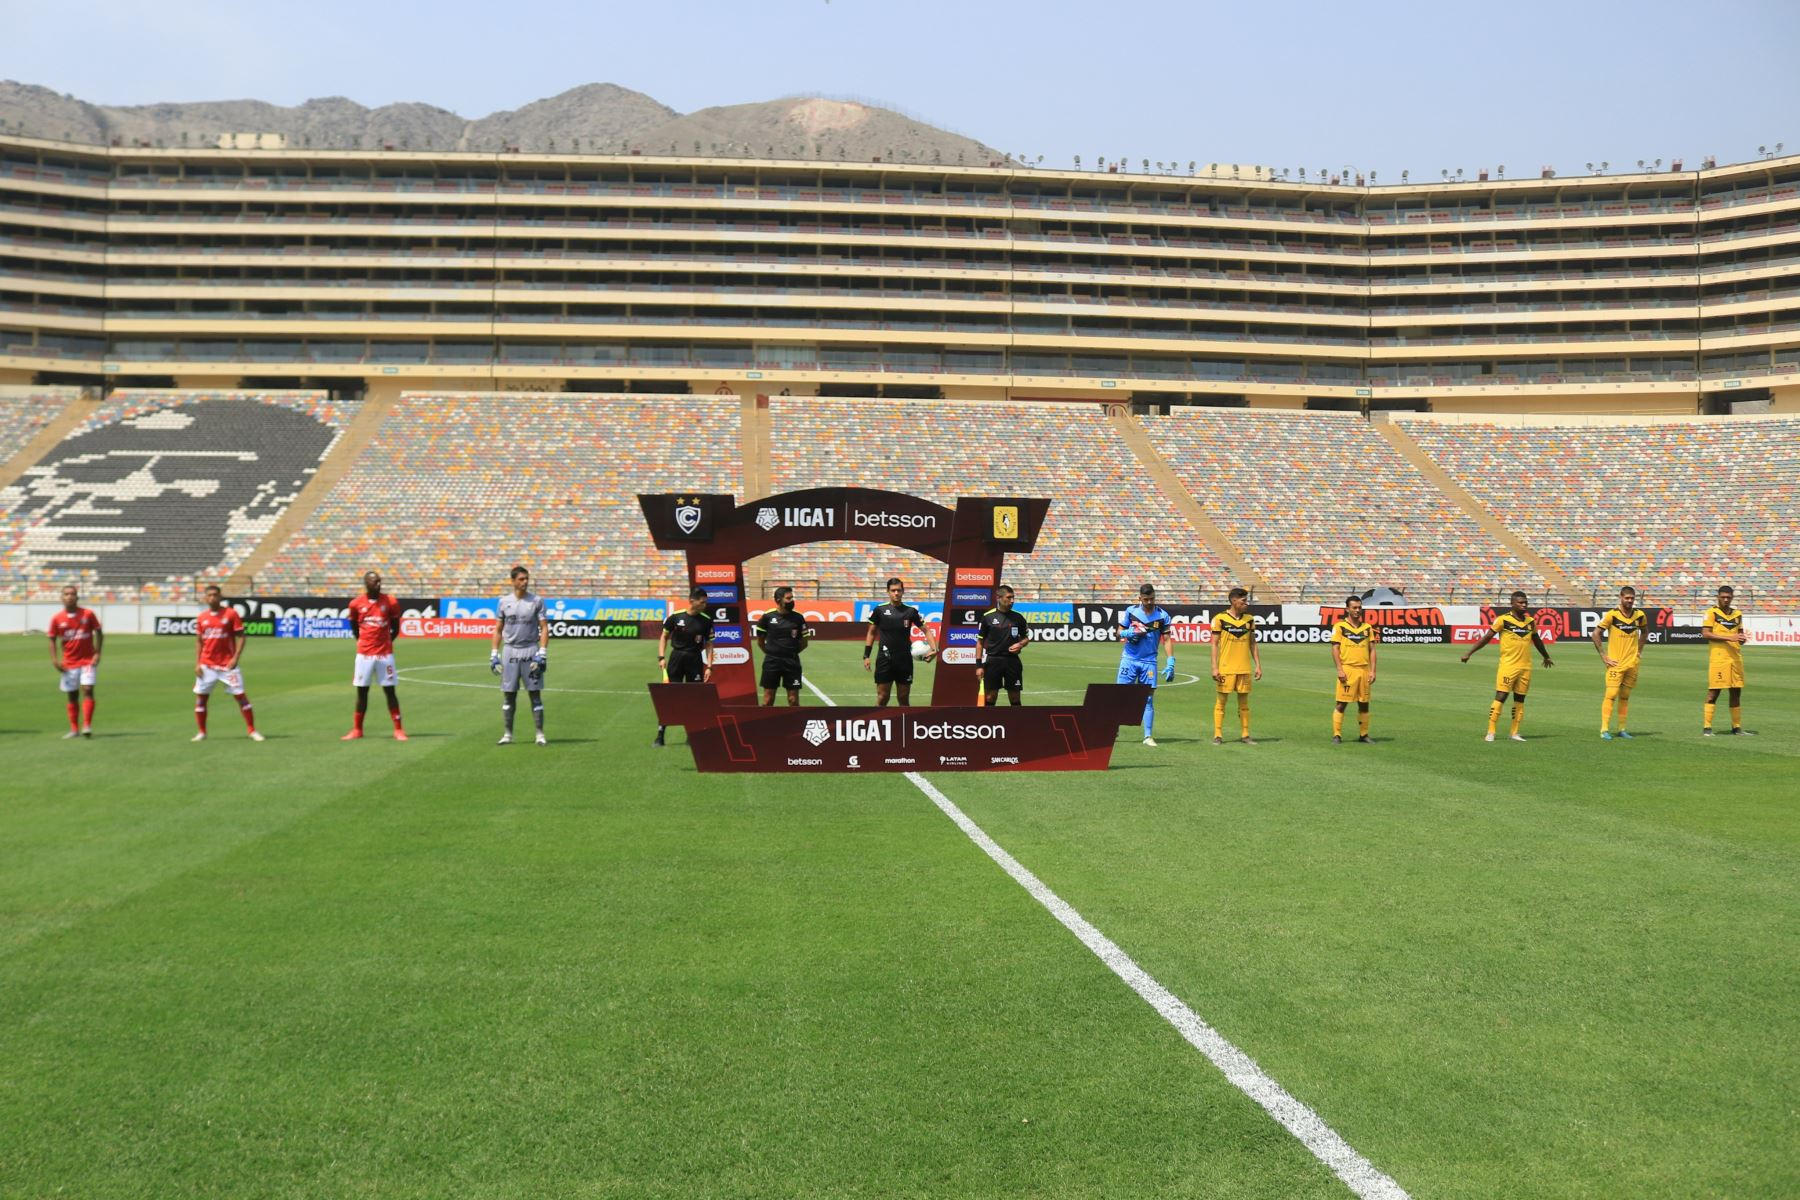 Cienciano del Cusco vence 2 a 0 a Deportivo Cantolao por la Liga 1.  Foto: ANDINA/Liga1